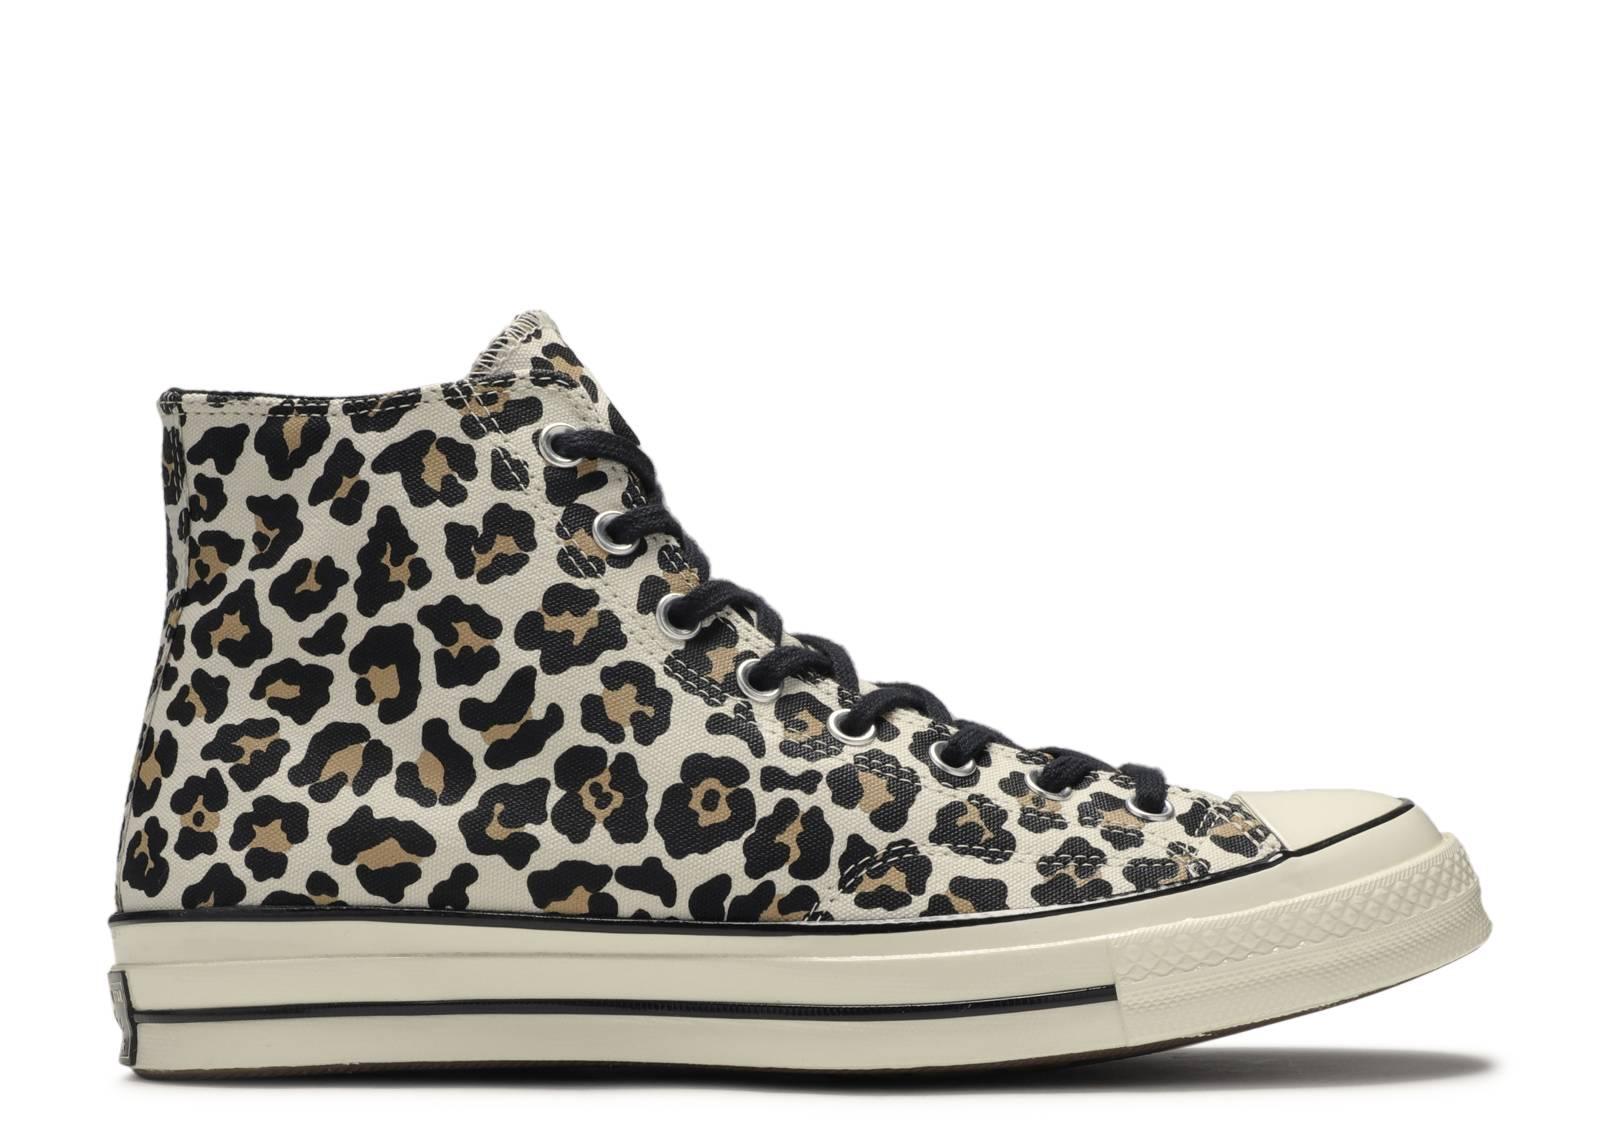 Converse Chuck 70 High 'Leopard Print'